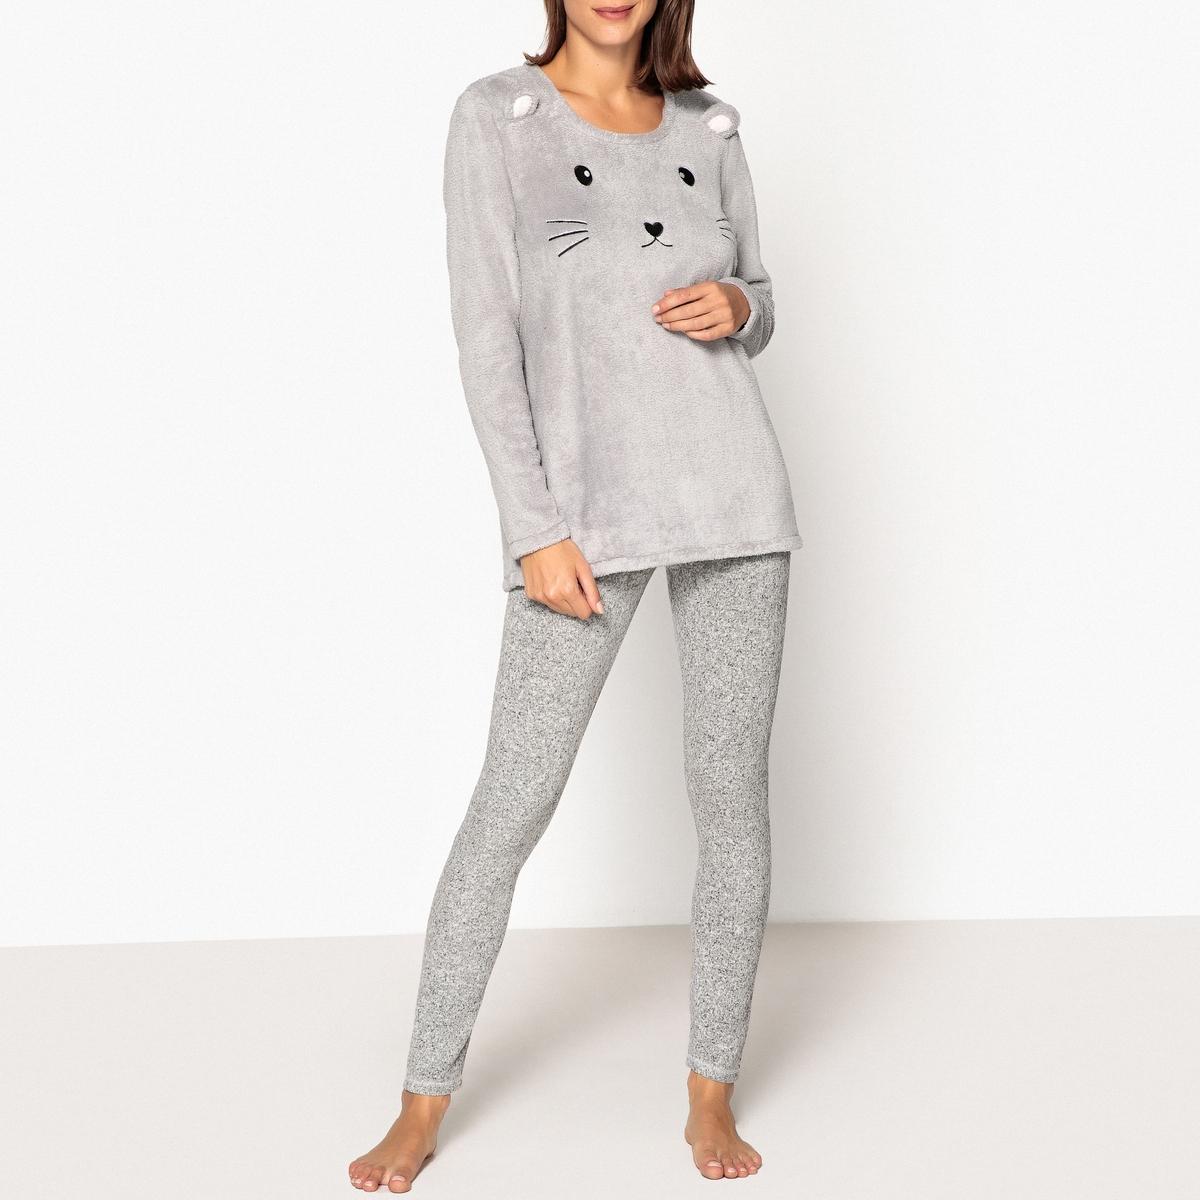 Pijama cálido